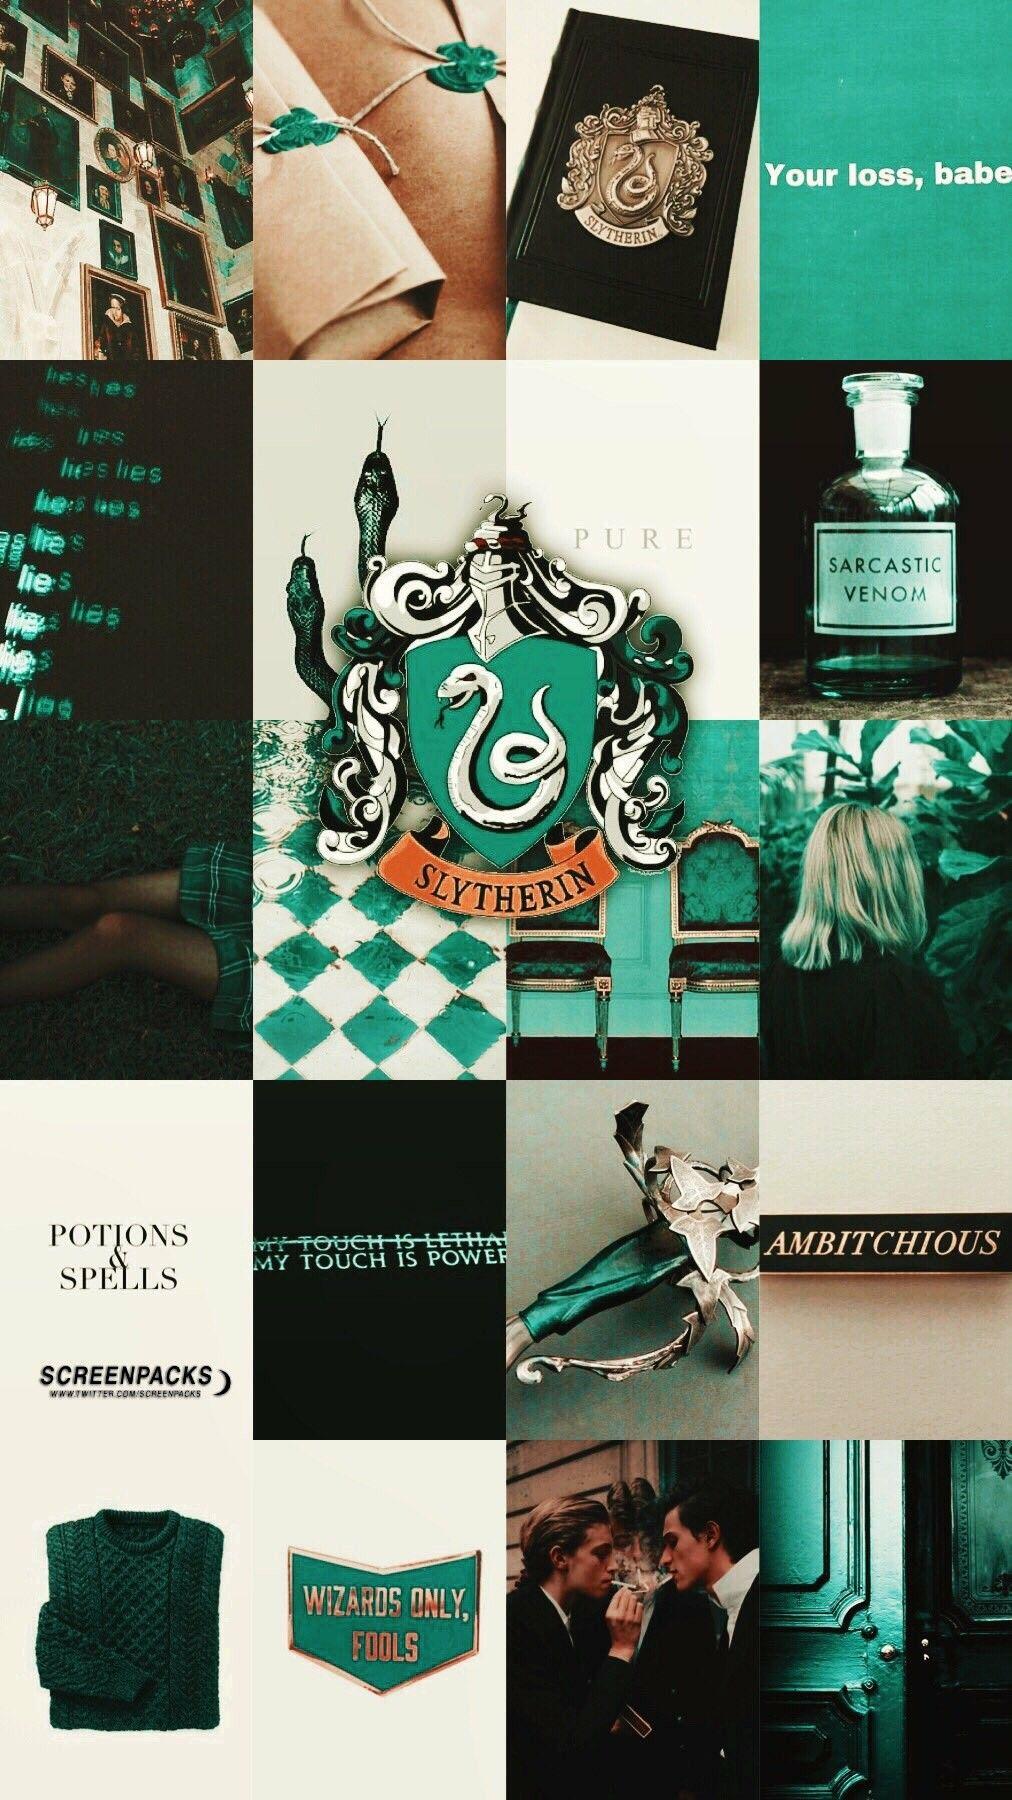 Wallpaper Screen Lock Slytherin Sonserina Papel De Parede Wallpaper Citacoes De Harry Potter Desenhos Para Papel De Parede